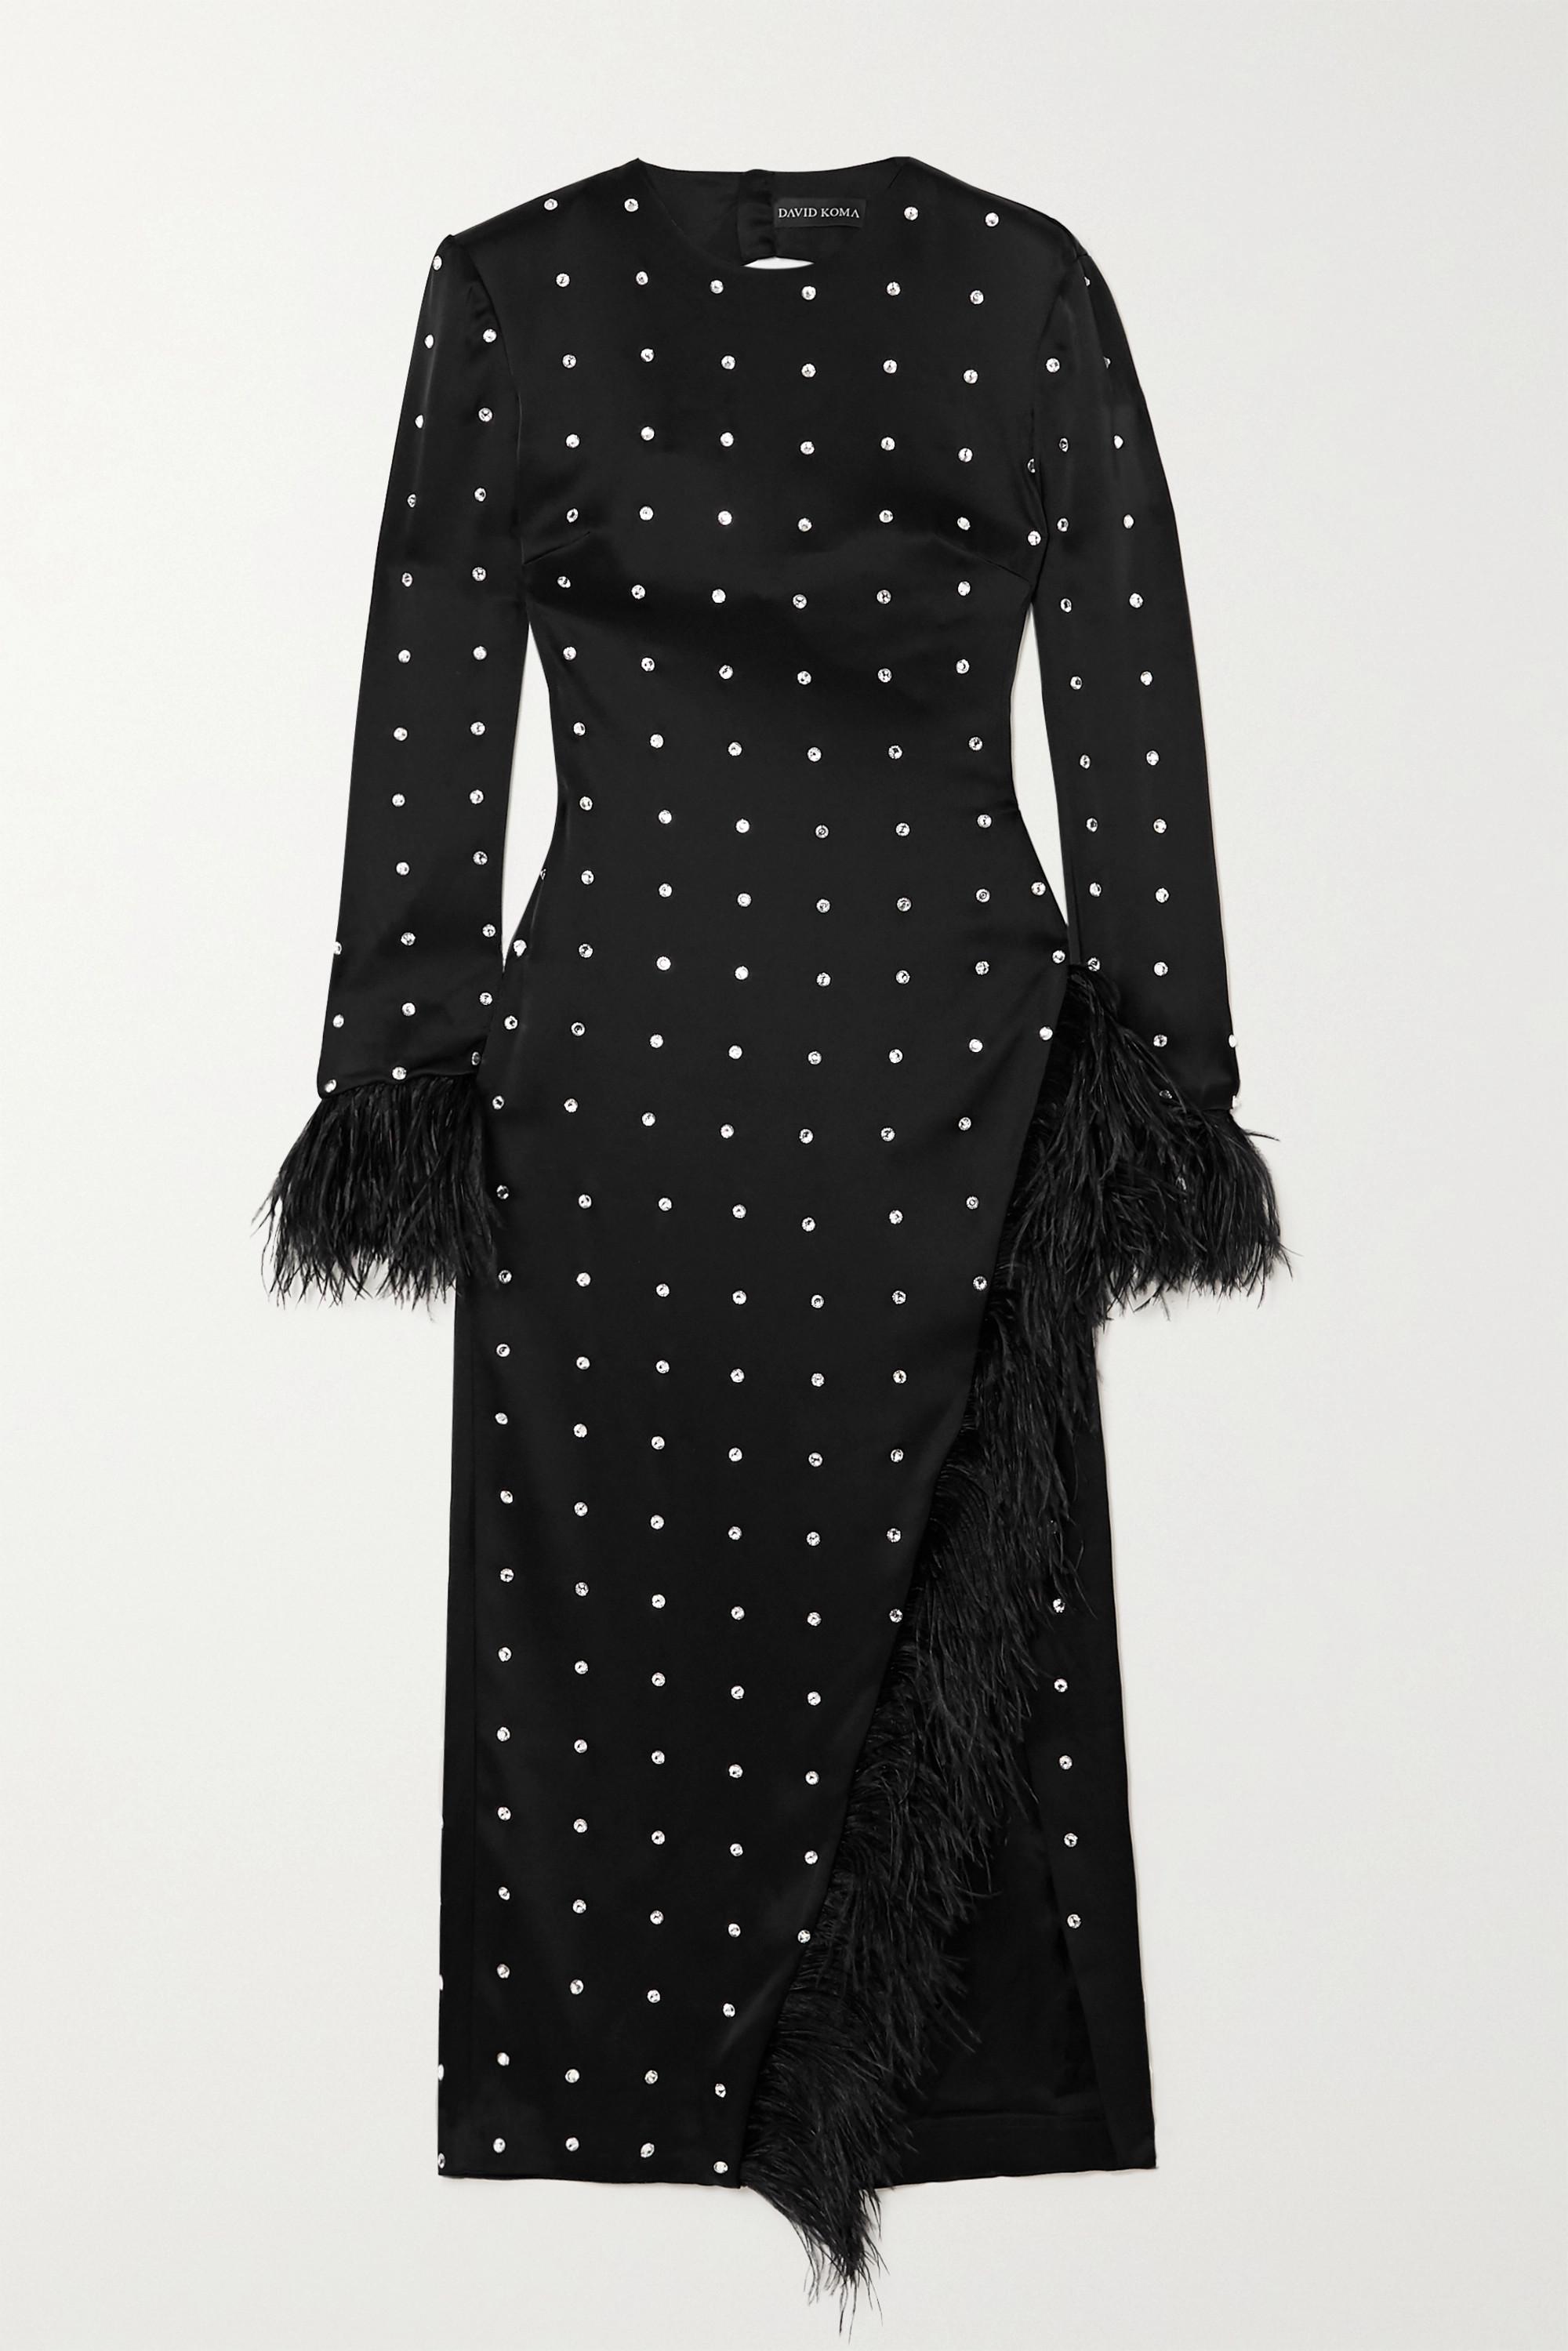 David Koma Open-back feather-trimmed crystal-embellished satin midi dress